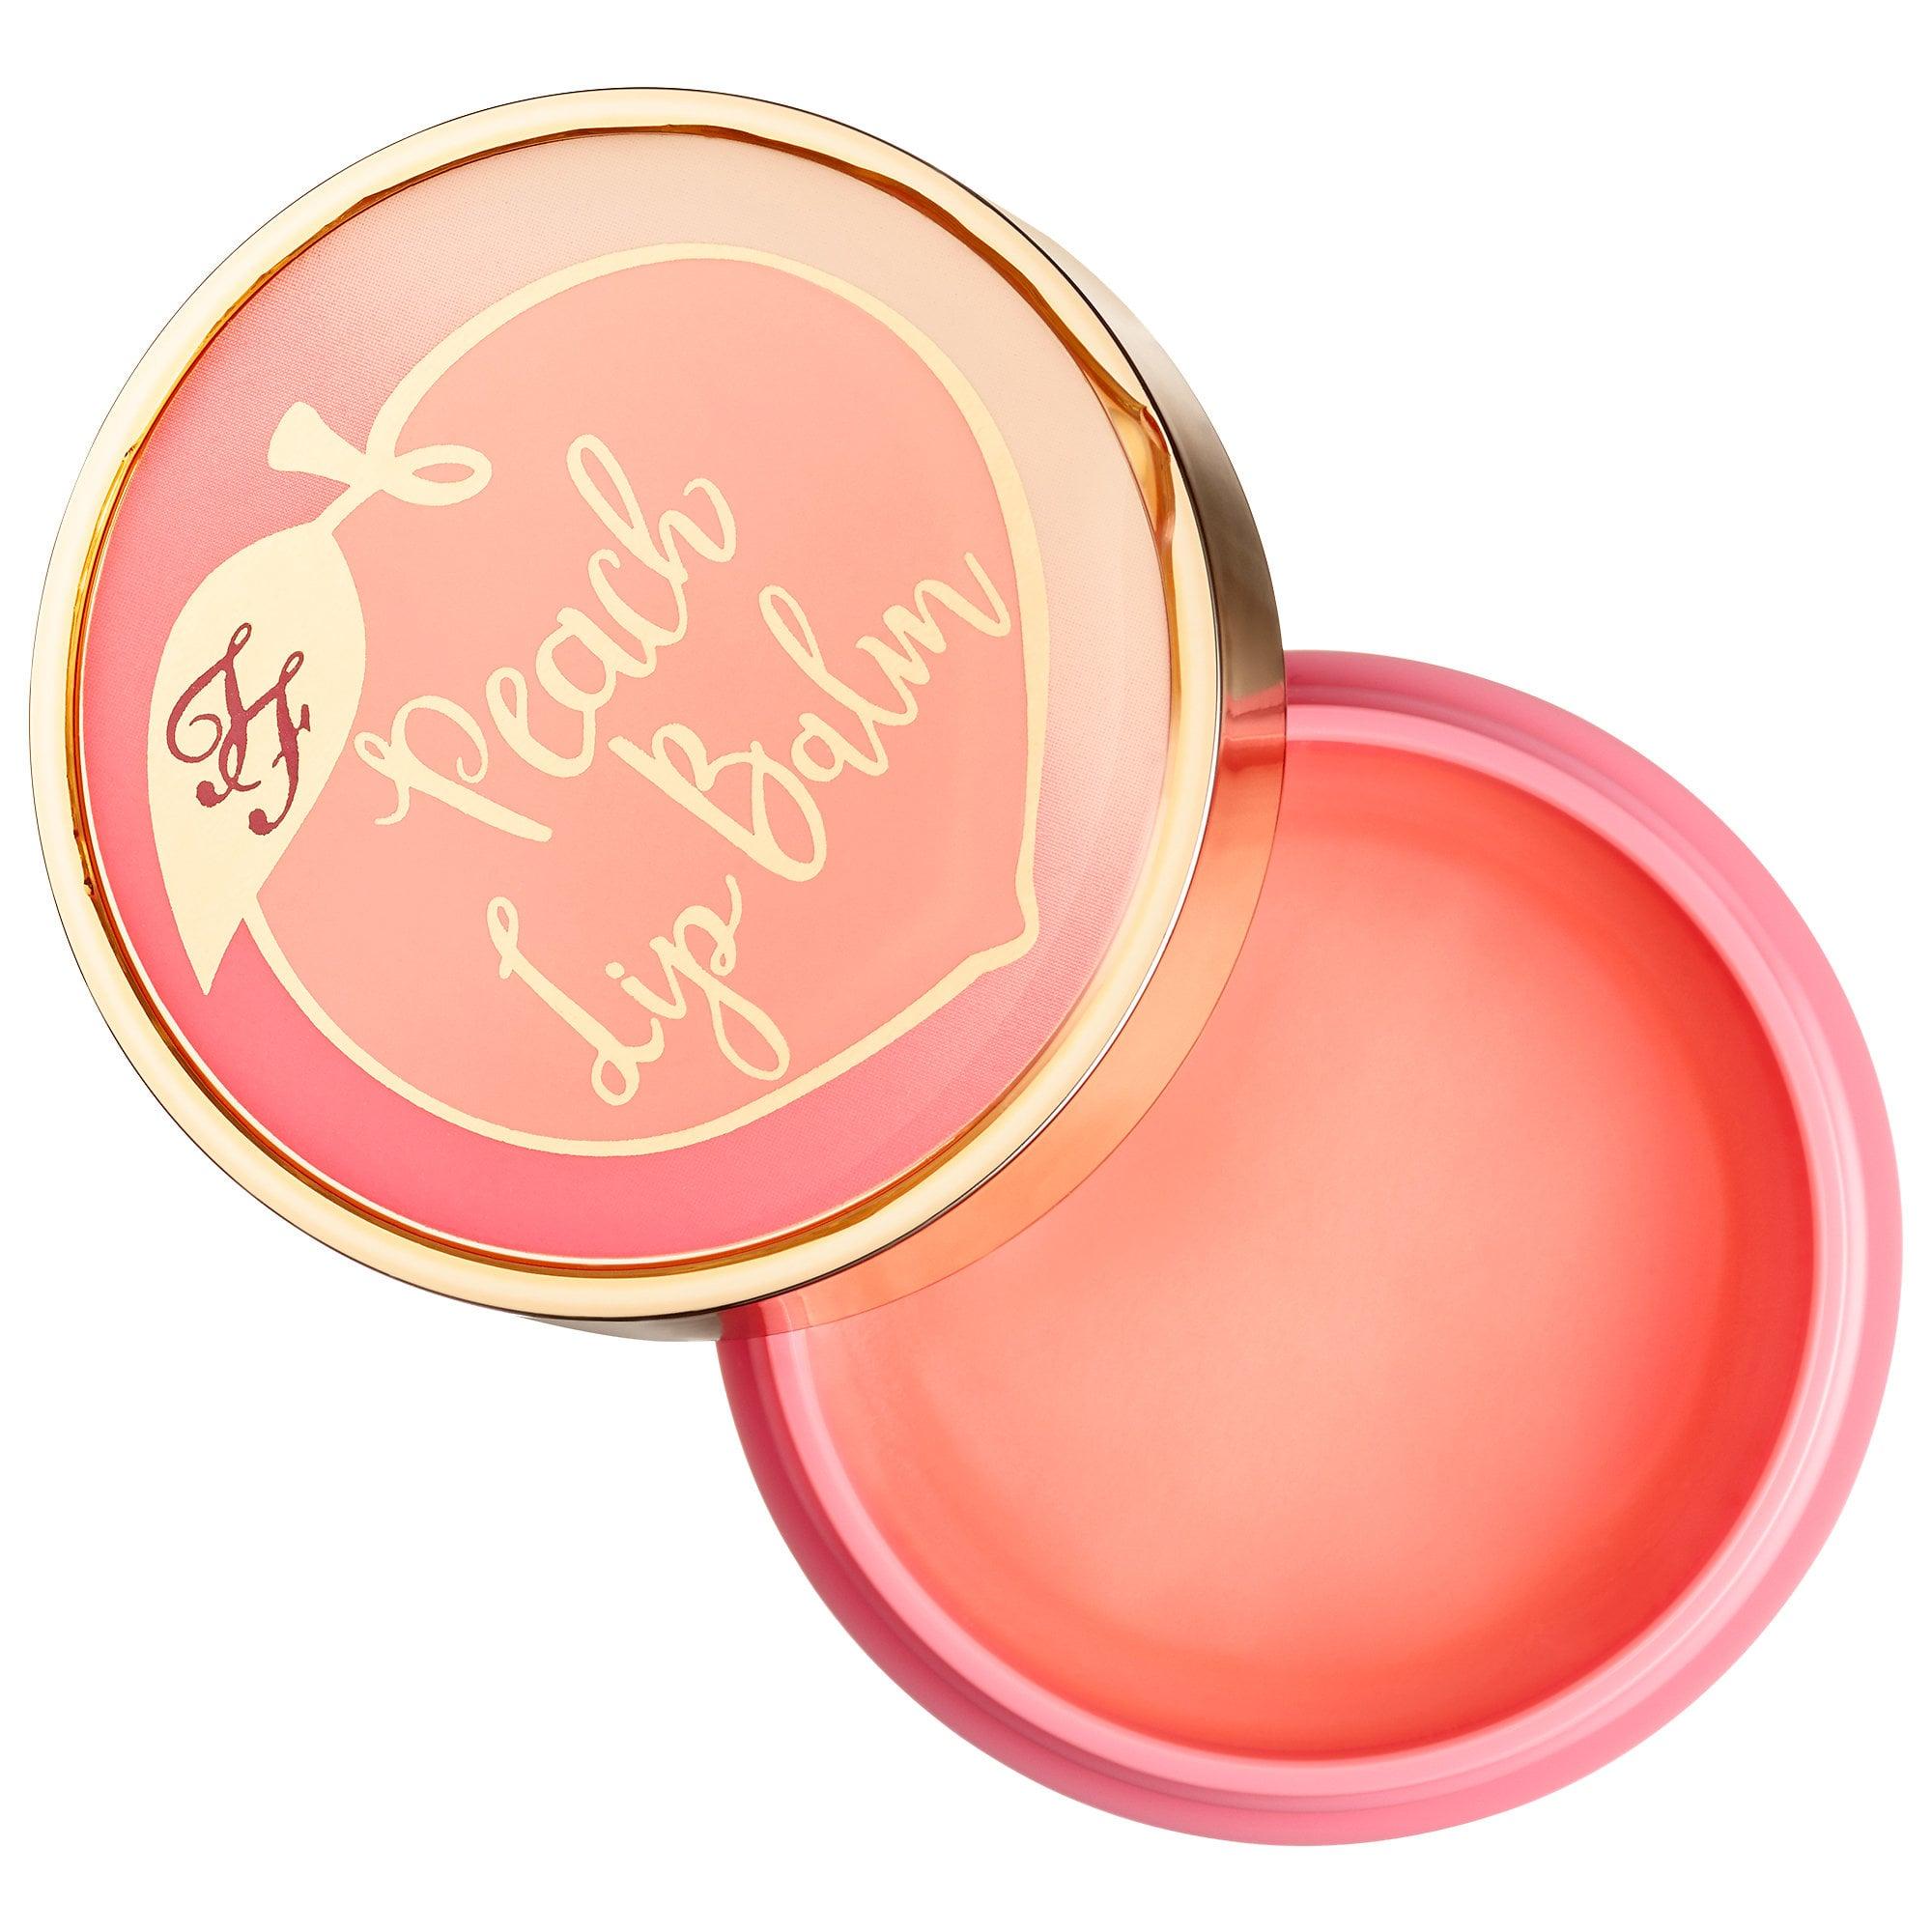 too-faced-peaches-and-cream.jpg